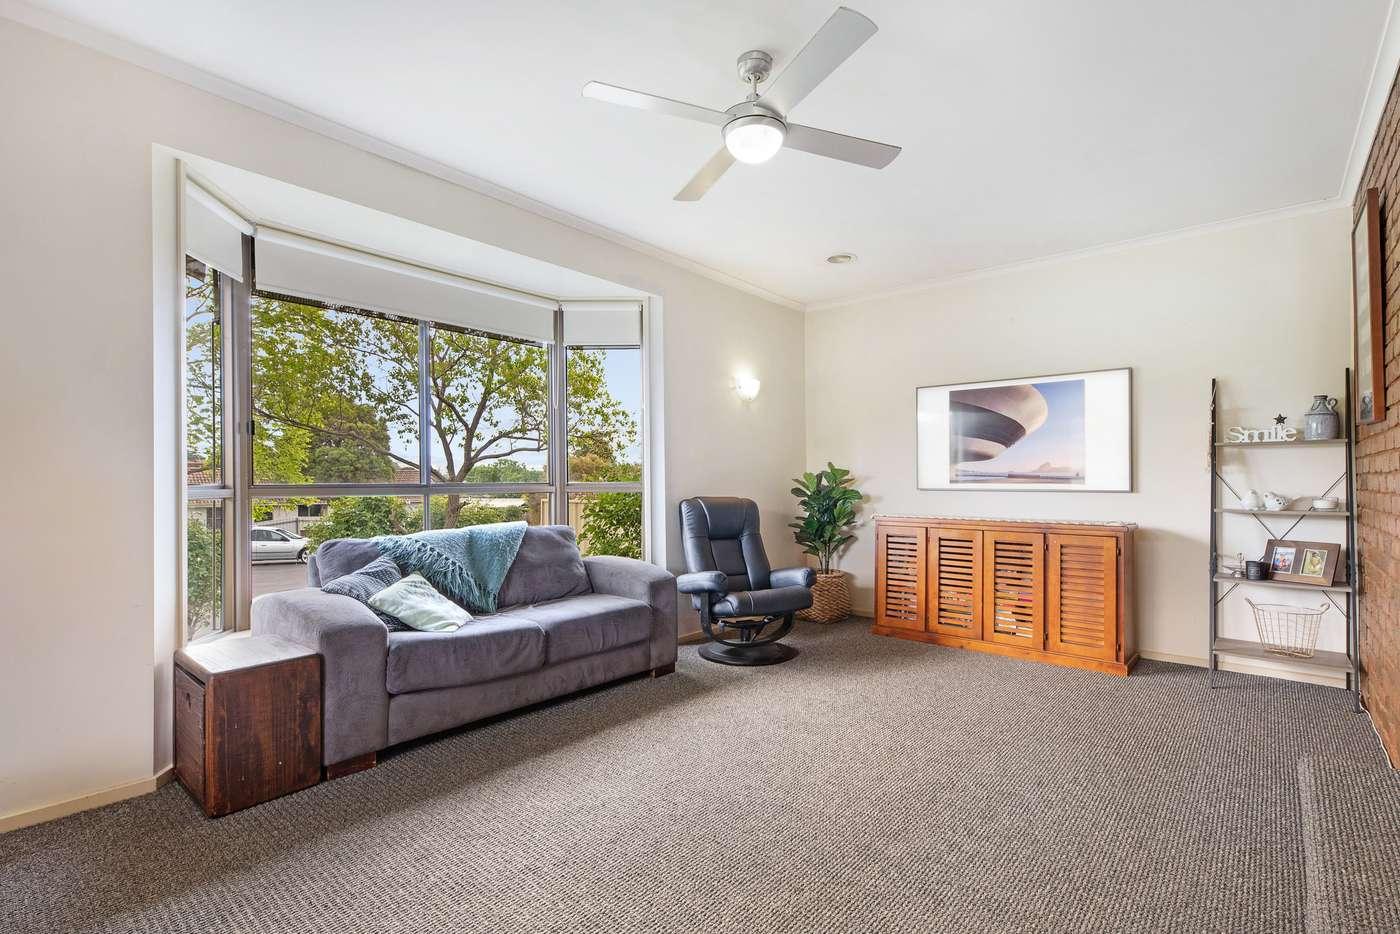 Sixth view of Homely house listing, 5 Skipton Ct, Wodonga VIC 3690